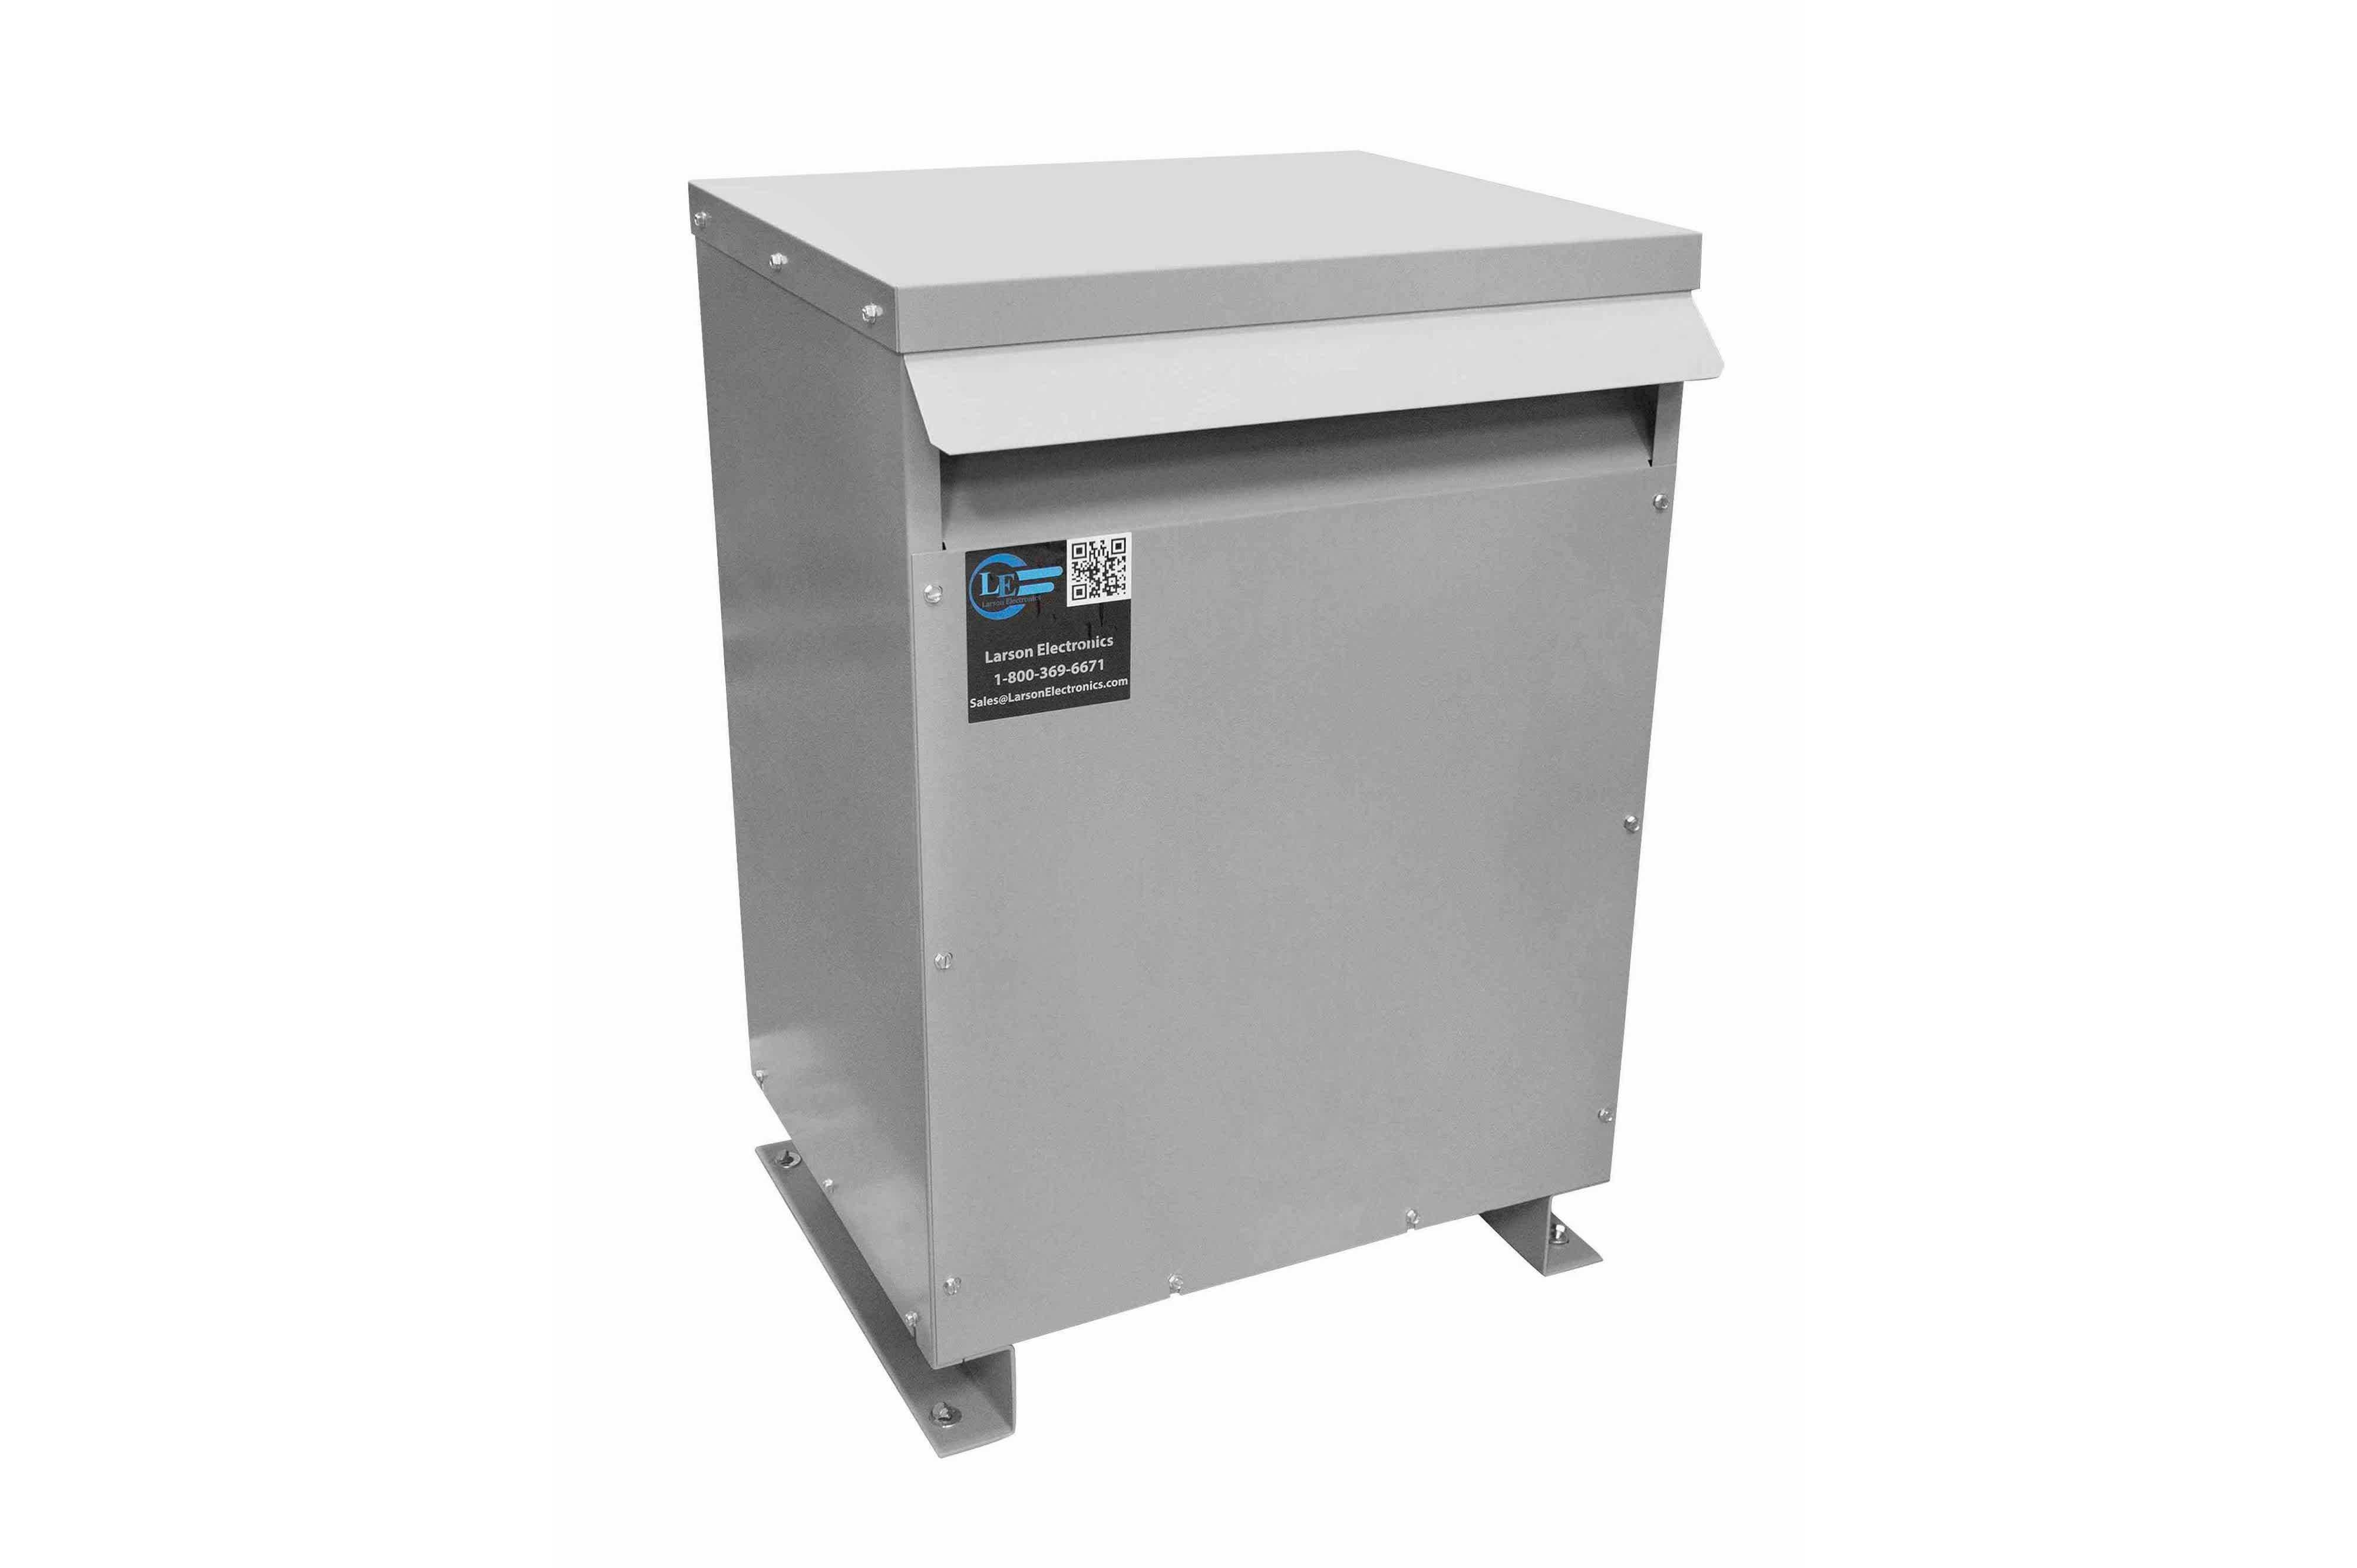 100 kVA 3PH DOE Transformer, 460V Delta Primary, 380Y/220 Wye-N Secondary, N3R, Ventilated, 60 Hz